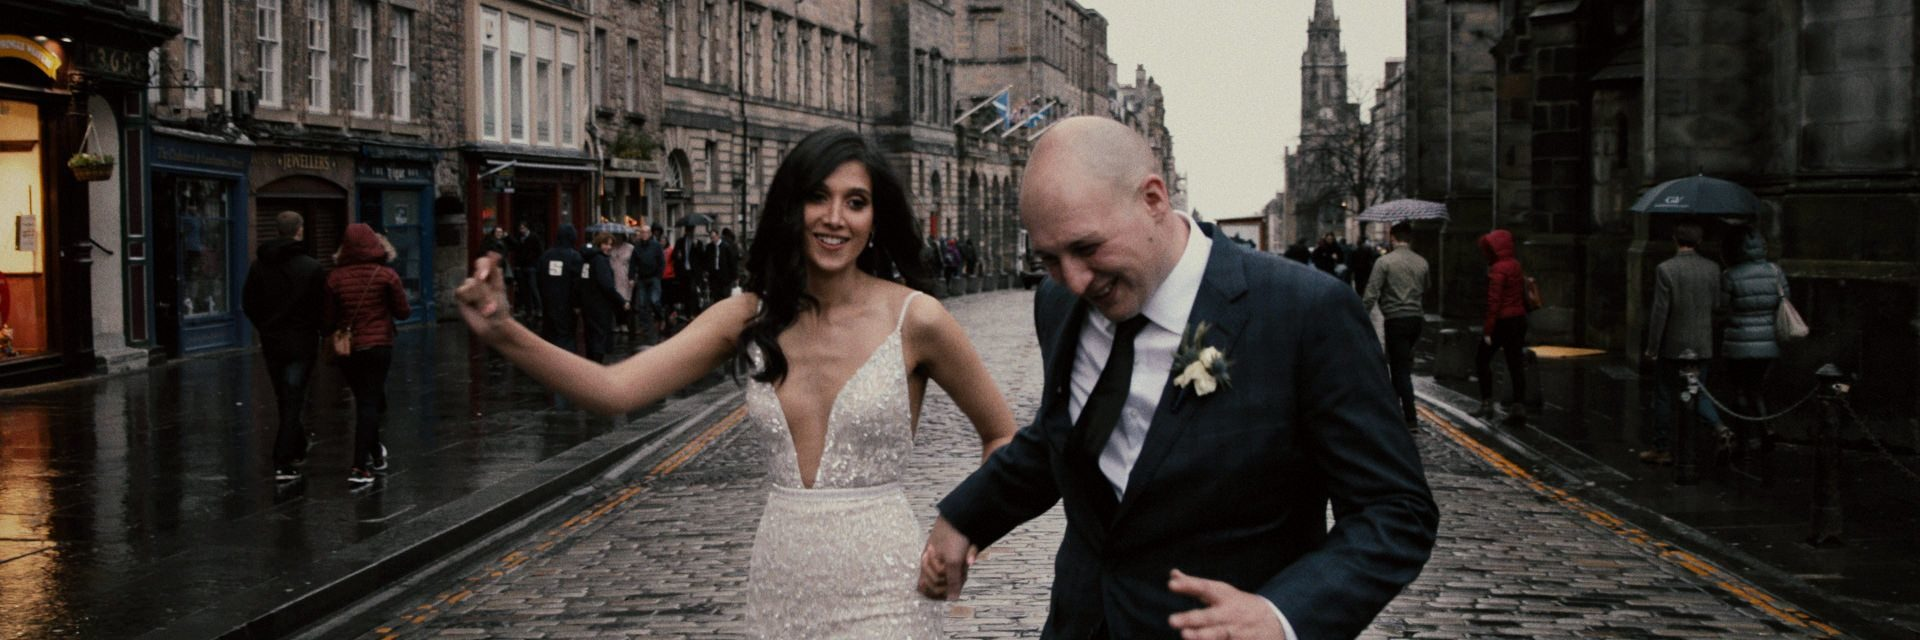 florance-wedding-videographer-cinemate-films-04